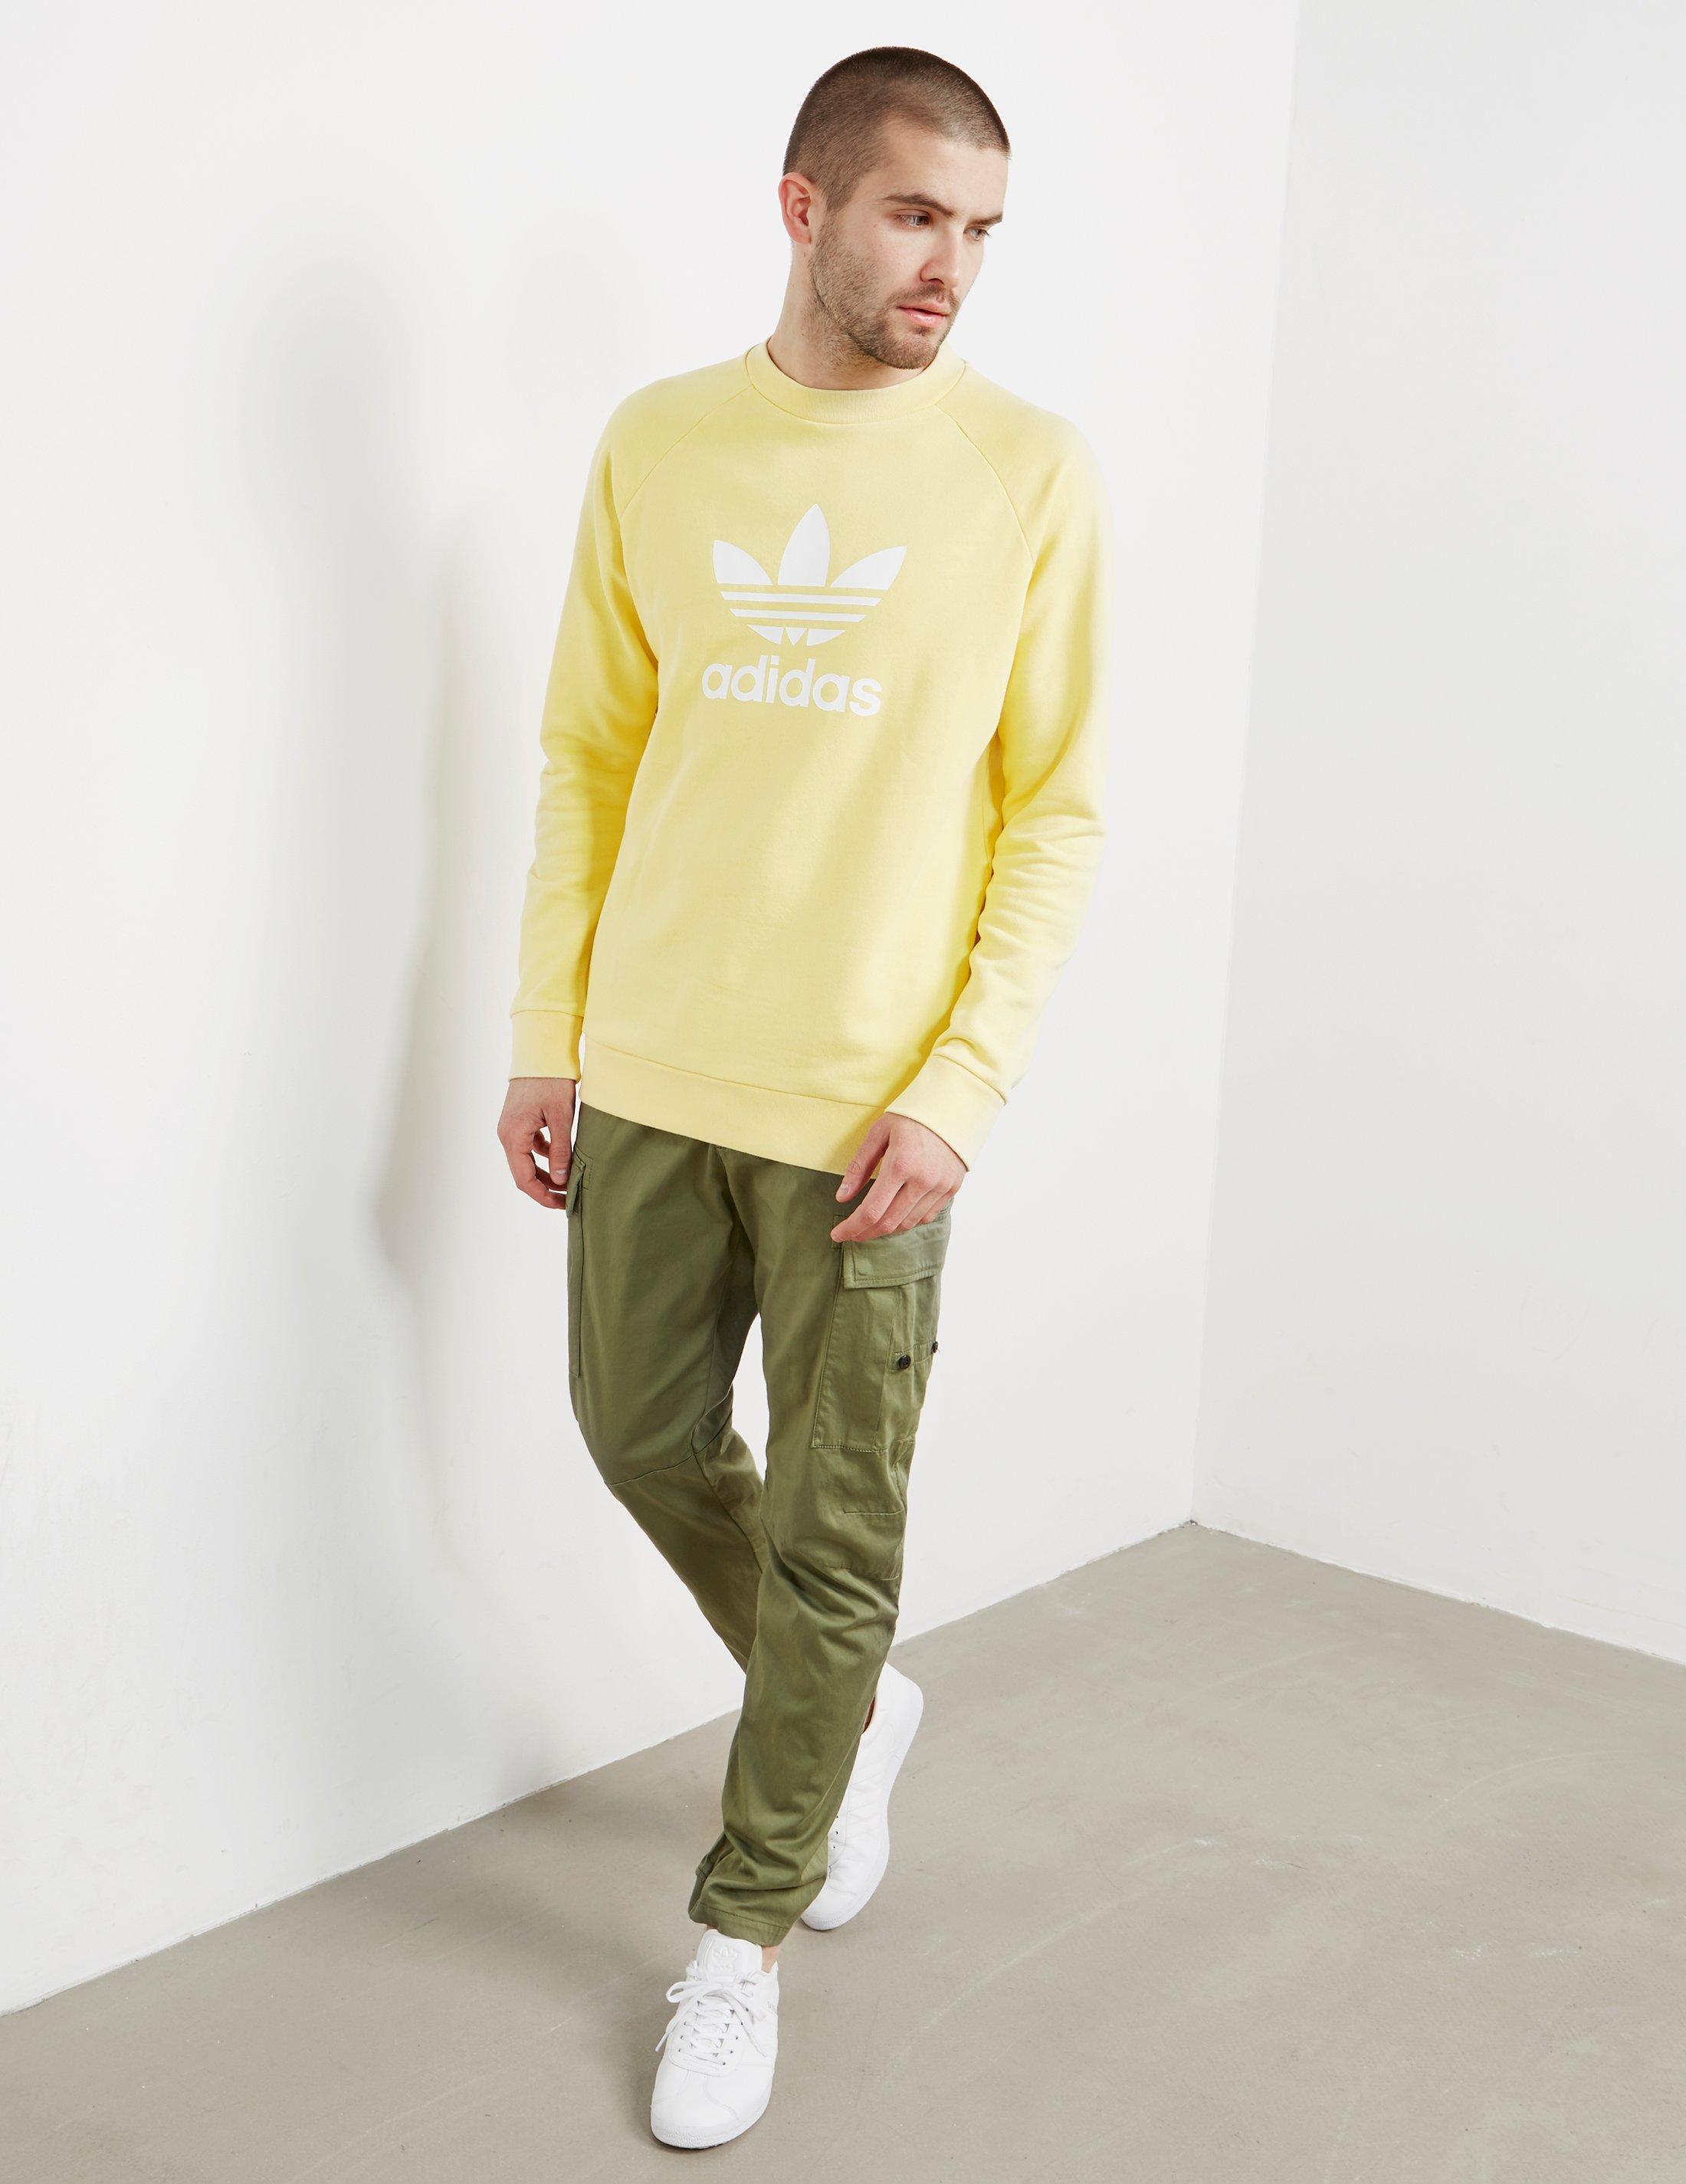 adidas hooded sweatshirt sale, adidas originals Trefoil T